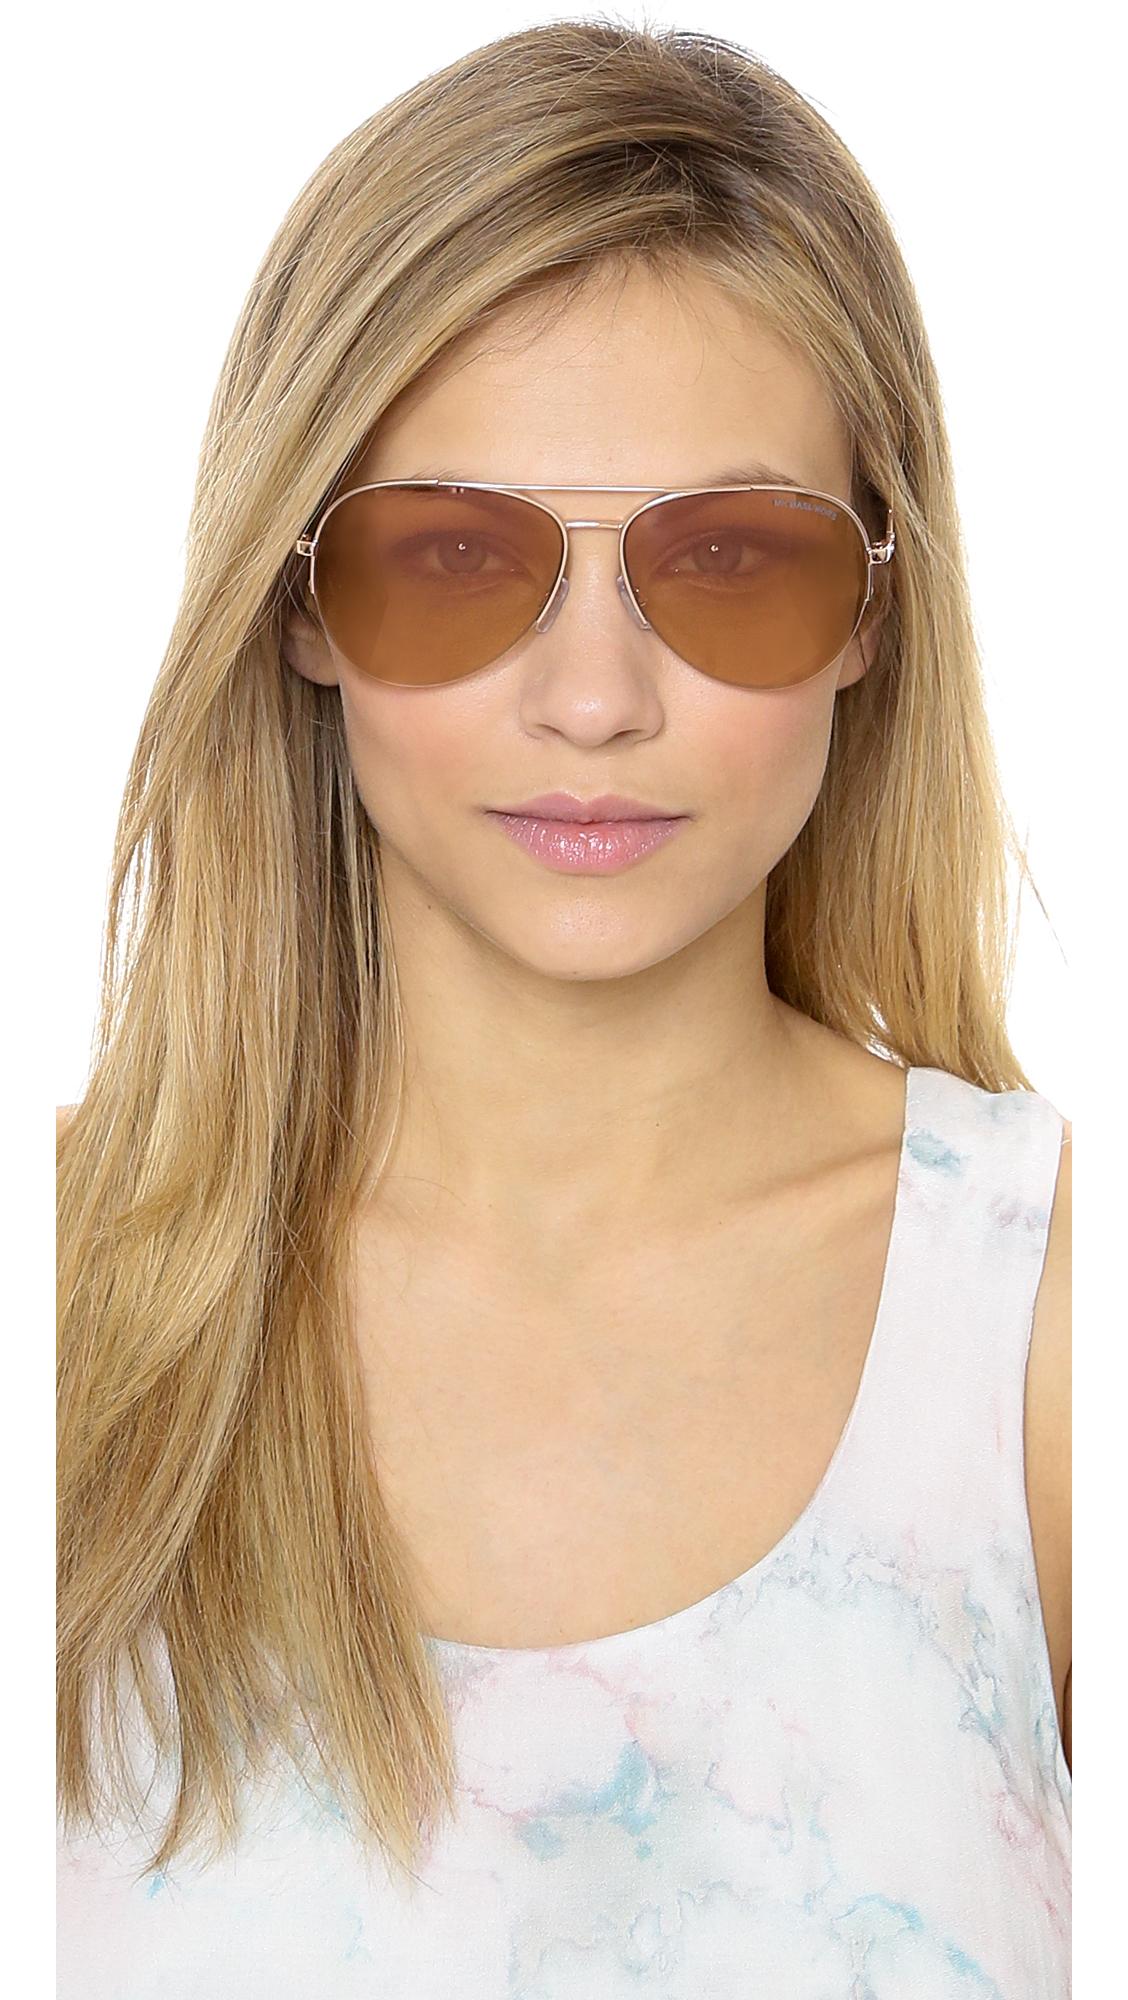 b3261c30c3 Michael Kors Chelsea Sunglasses Rose Gold